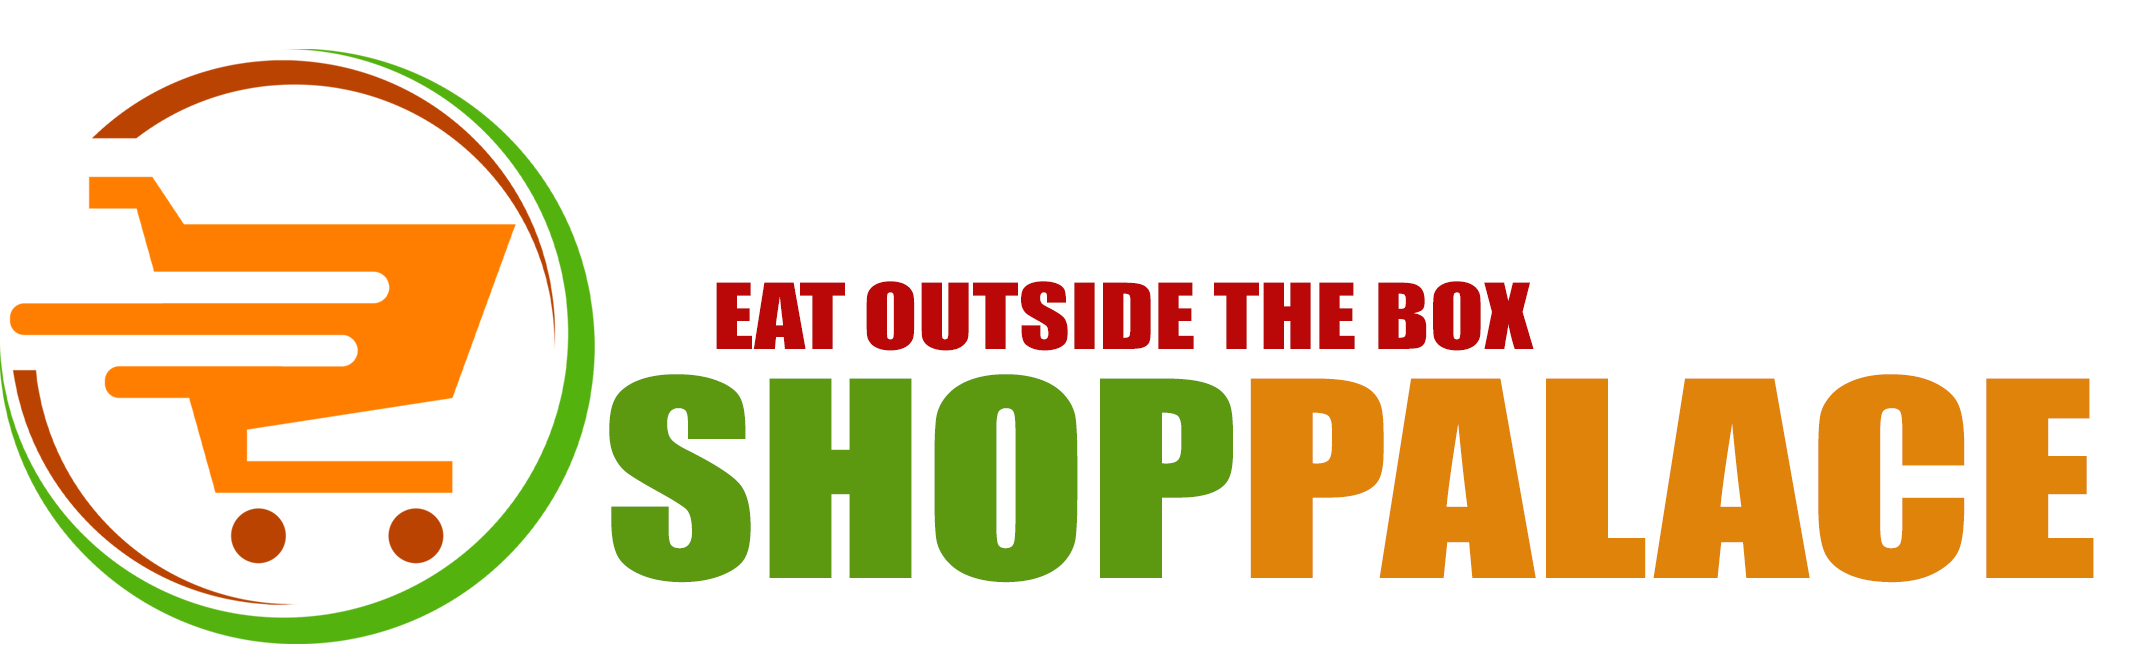 Shop Palace